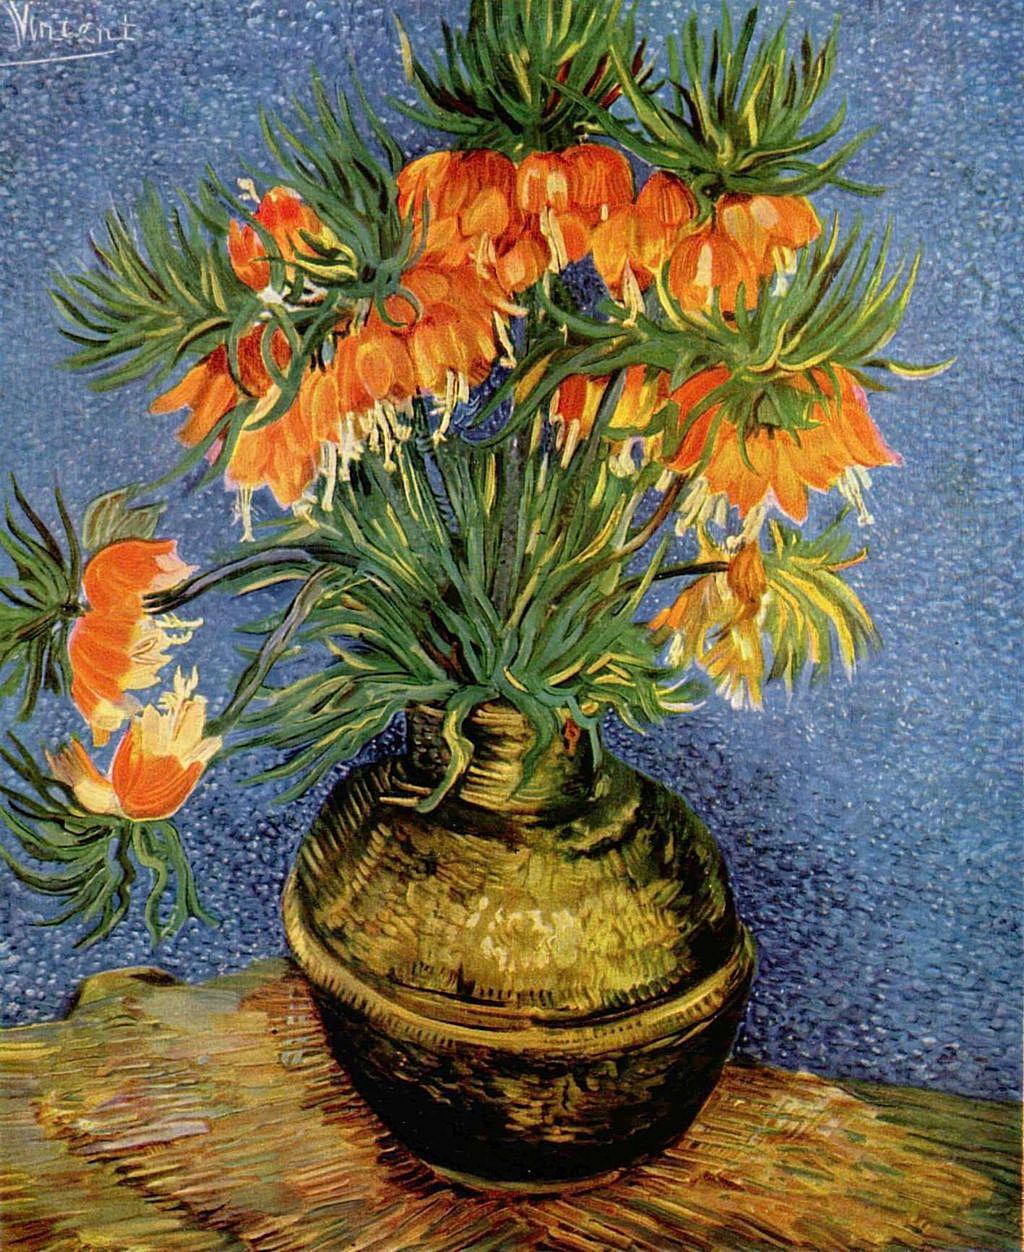 still life with frutillarias vincent van gogh 1853 1890